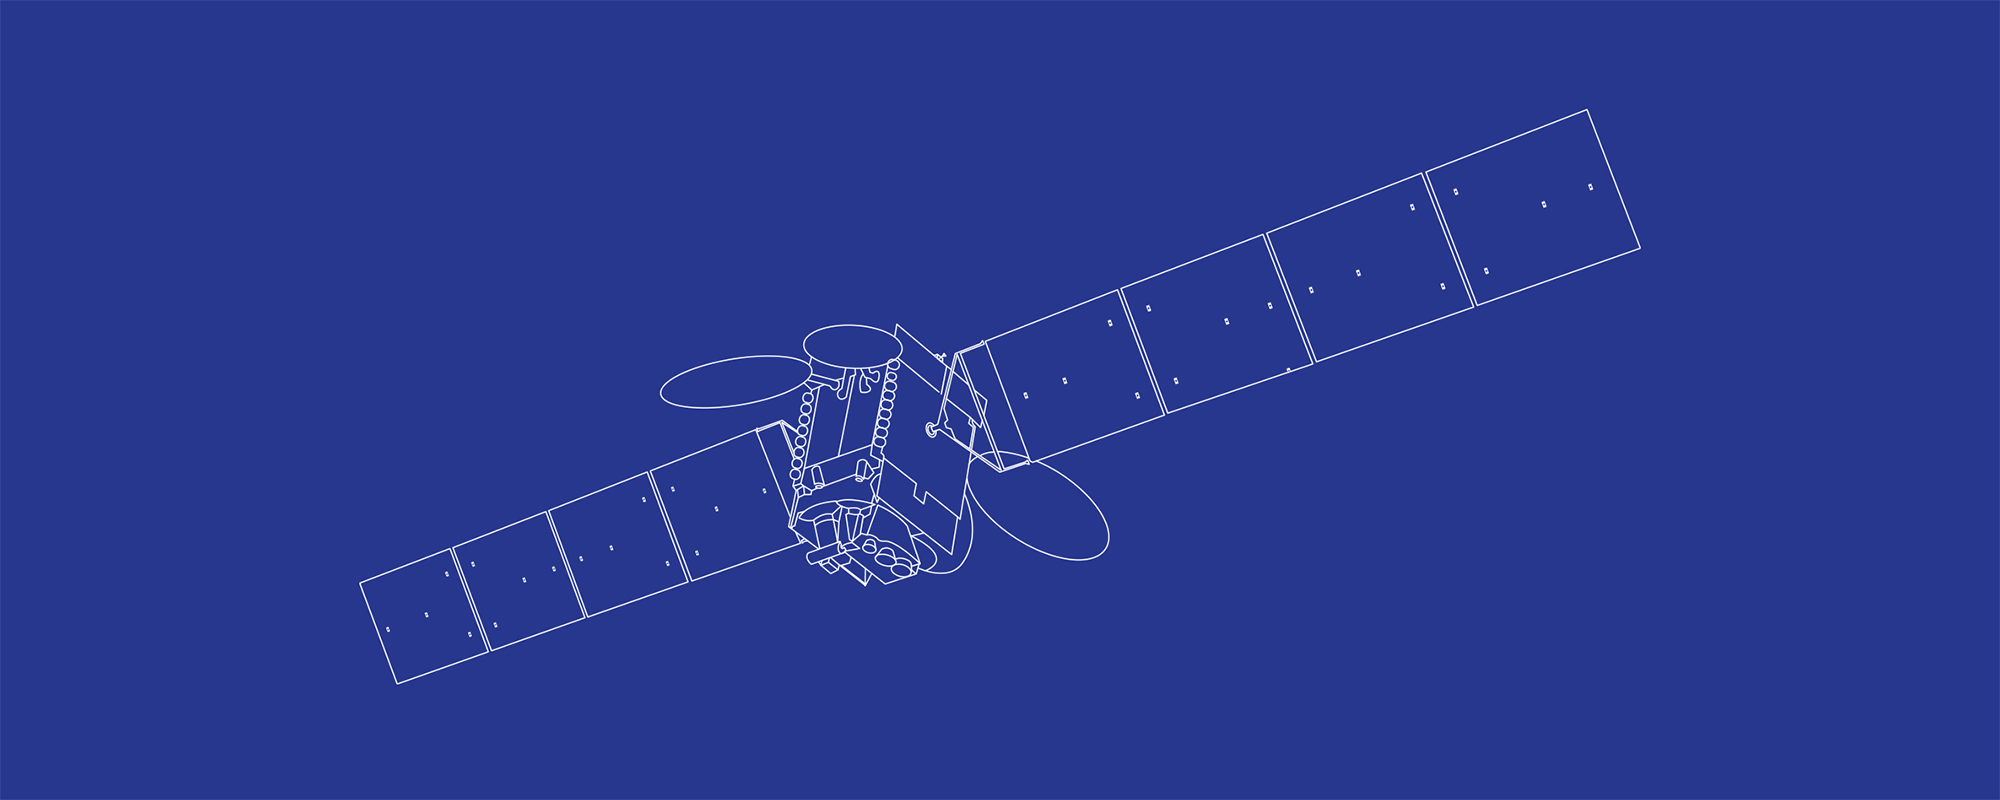 hight resolution of dish network satellite setup diagram